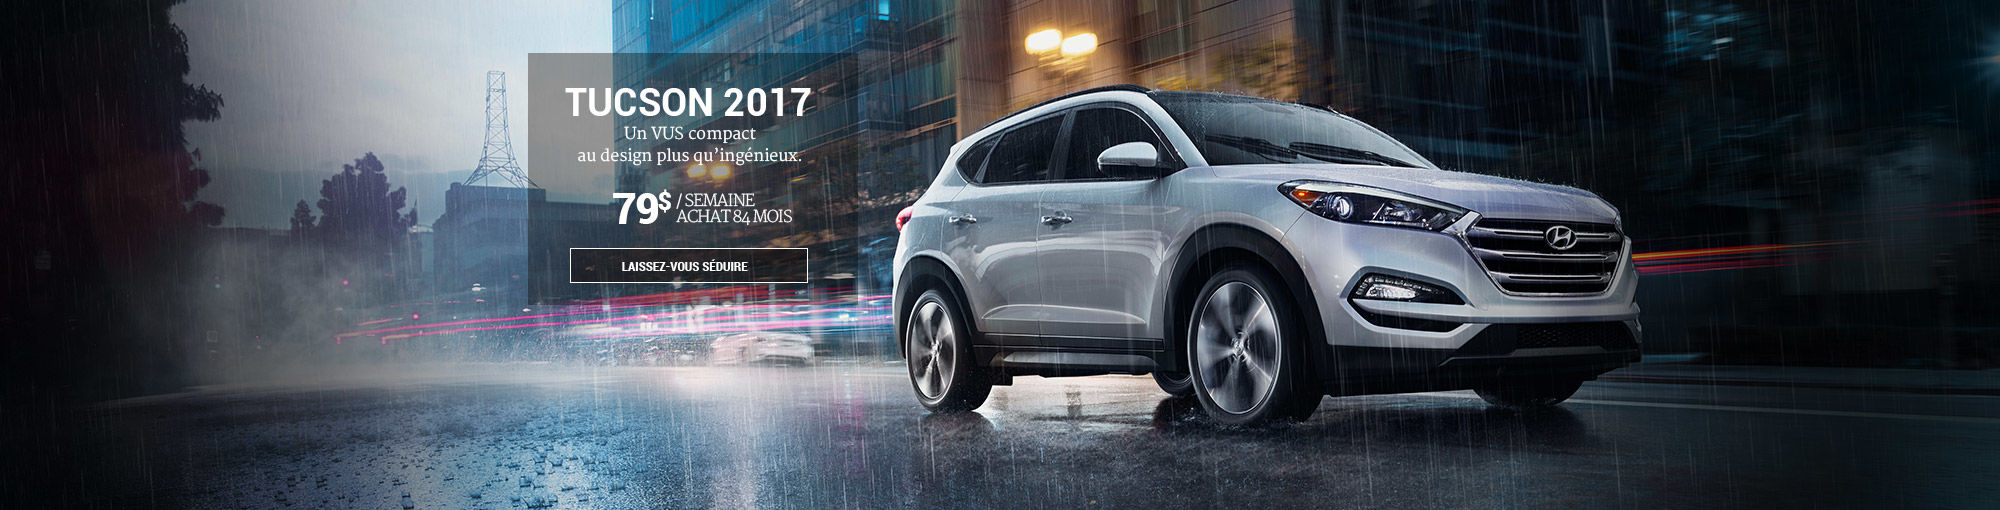 Hyundai Tucson 2017 header février